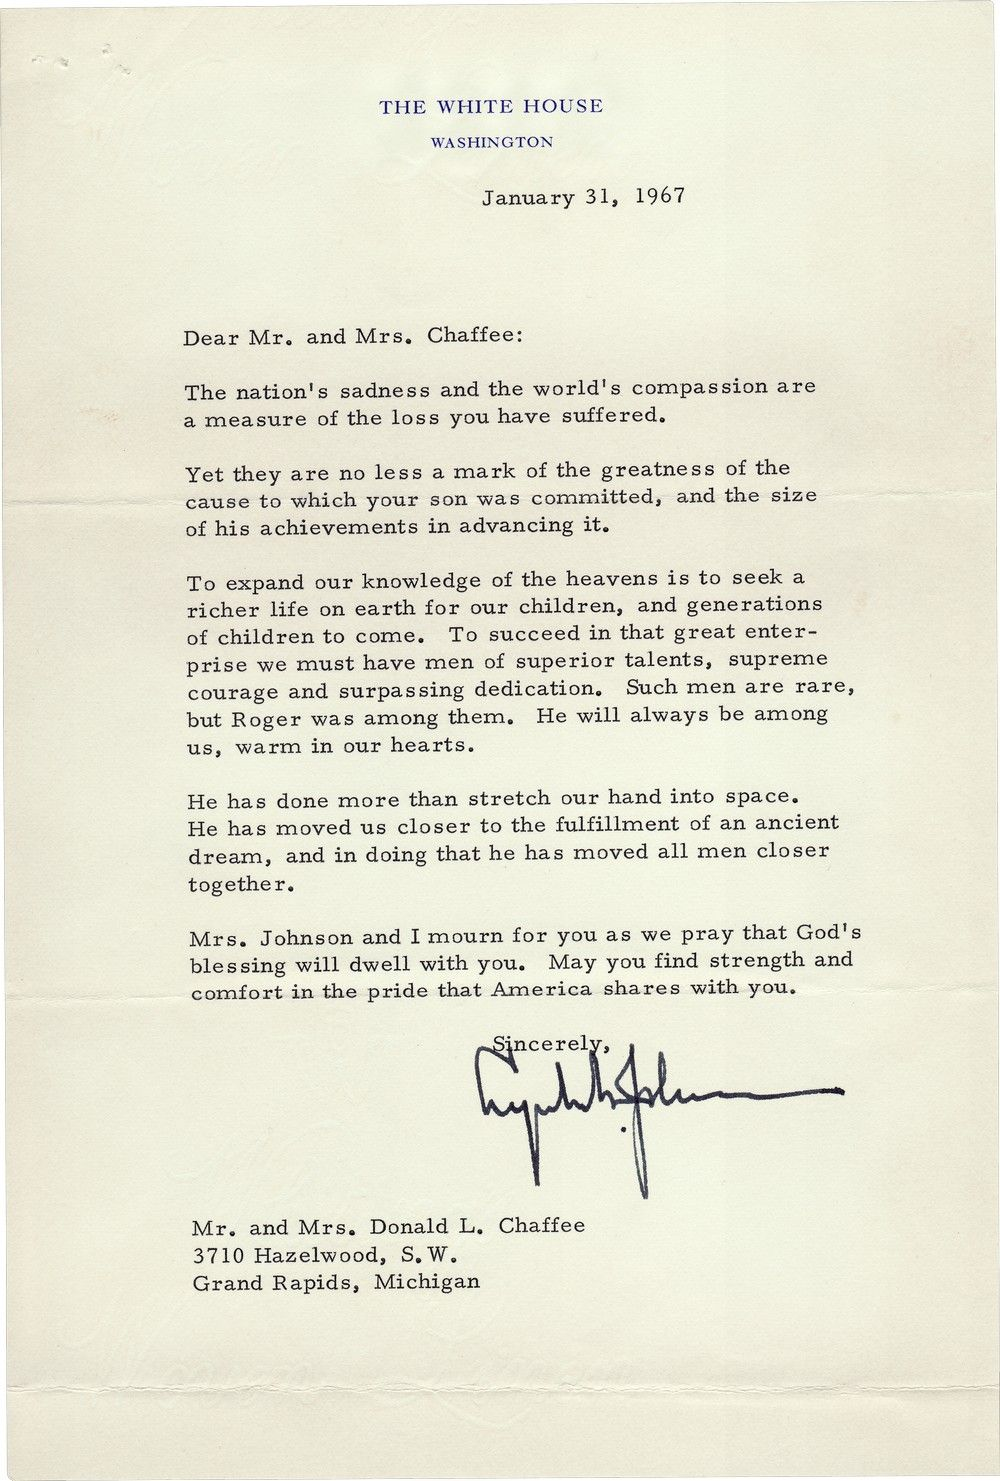 Lyndon B. Johnson on the Death of an Astronaut in the Apollo I Fire